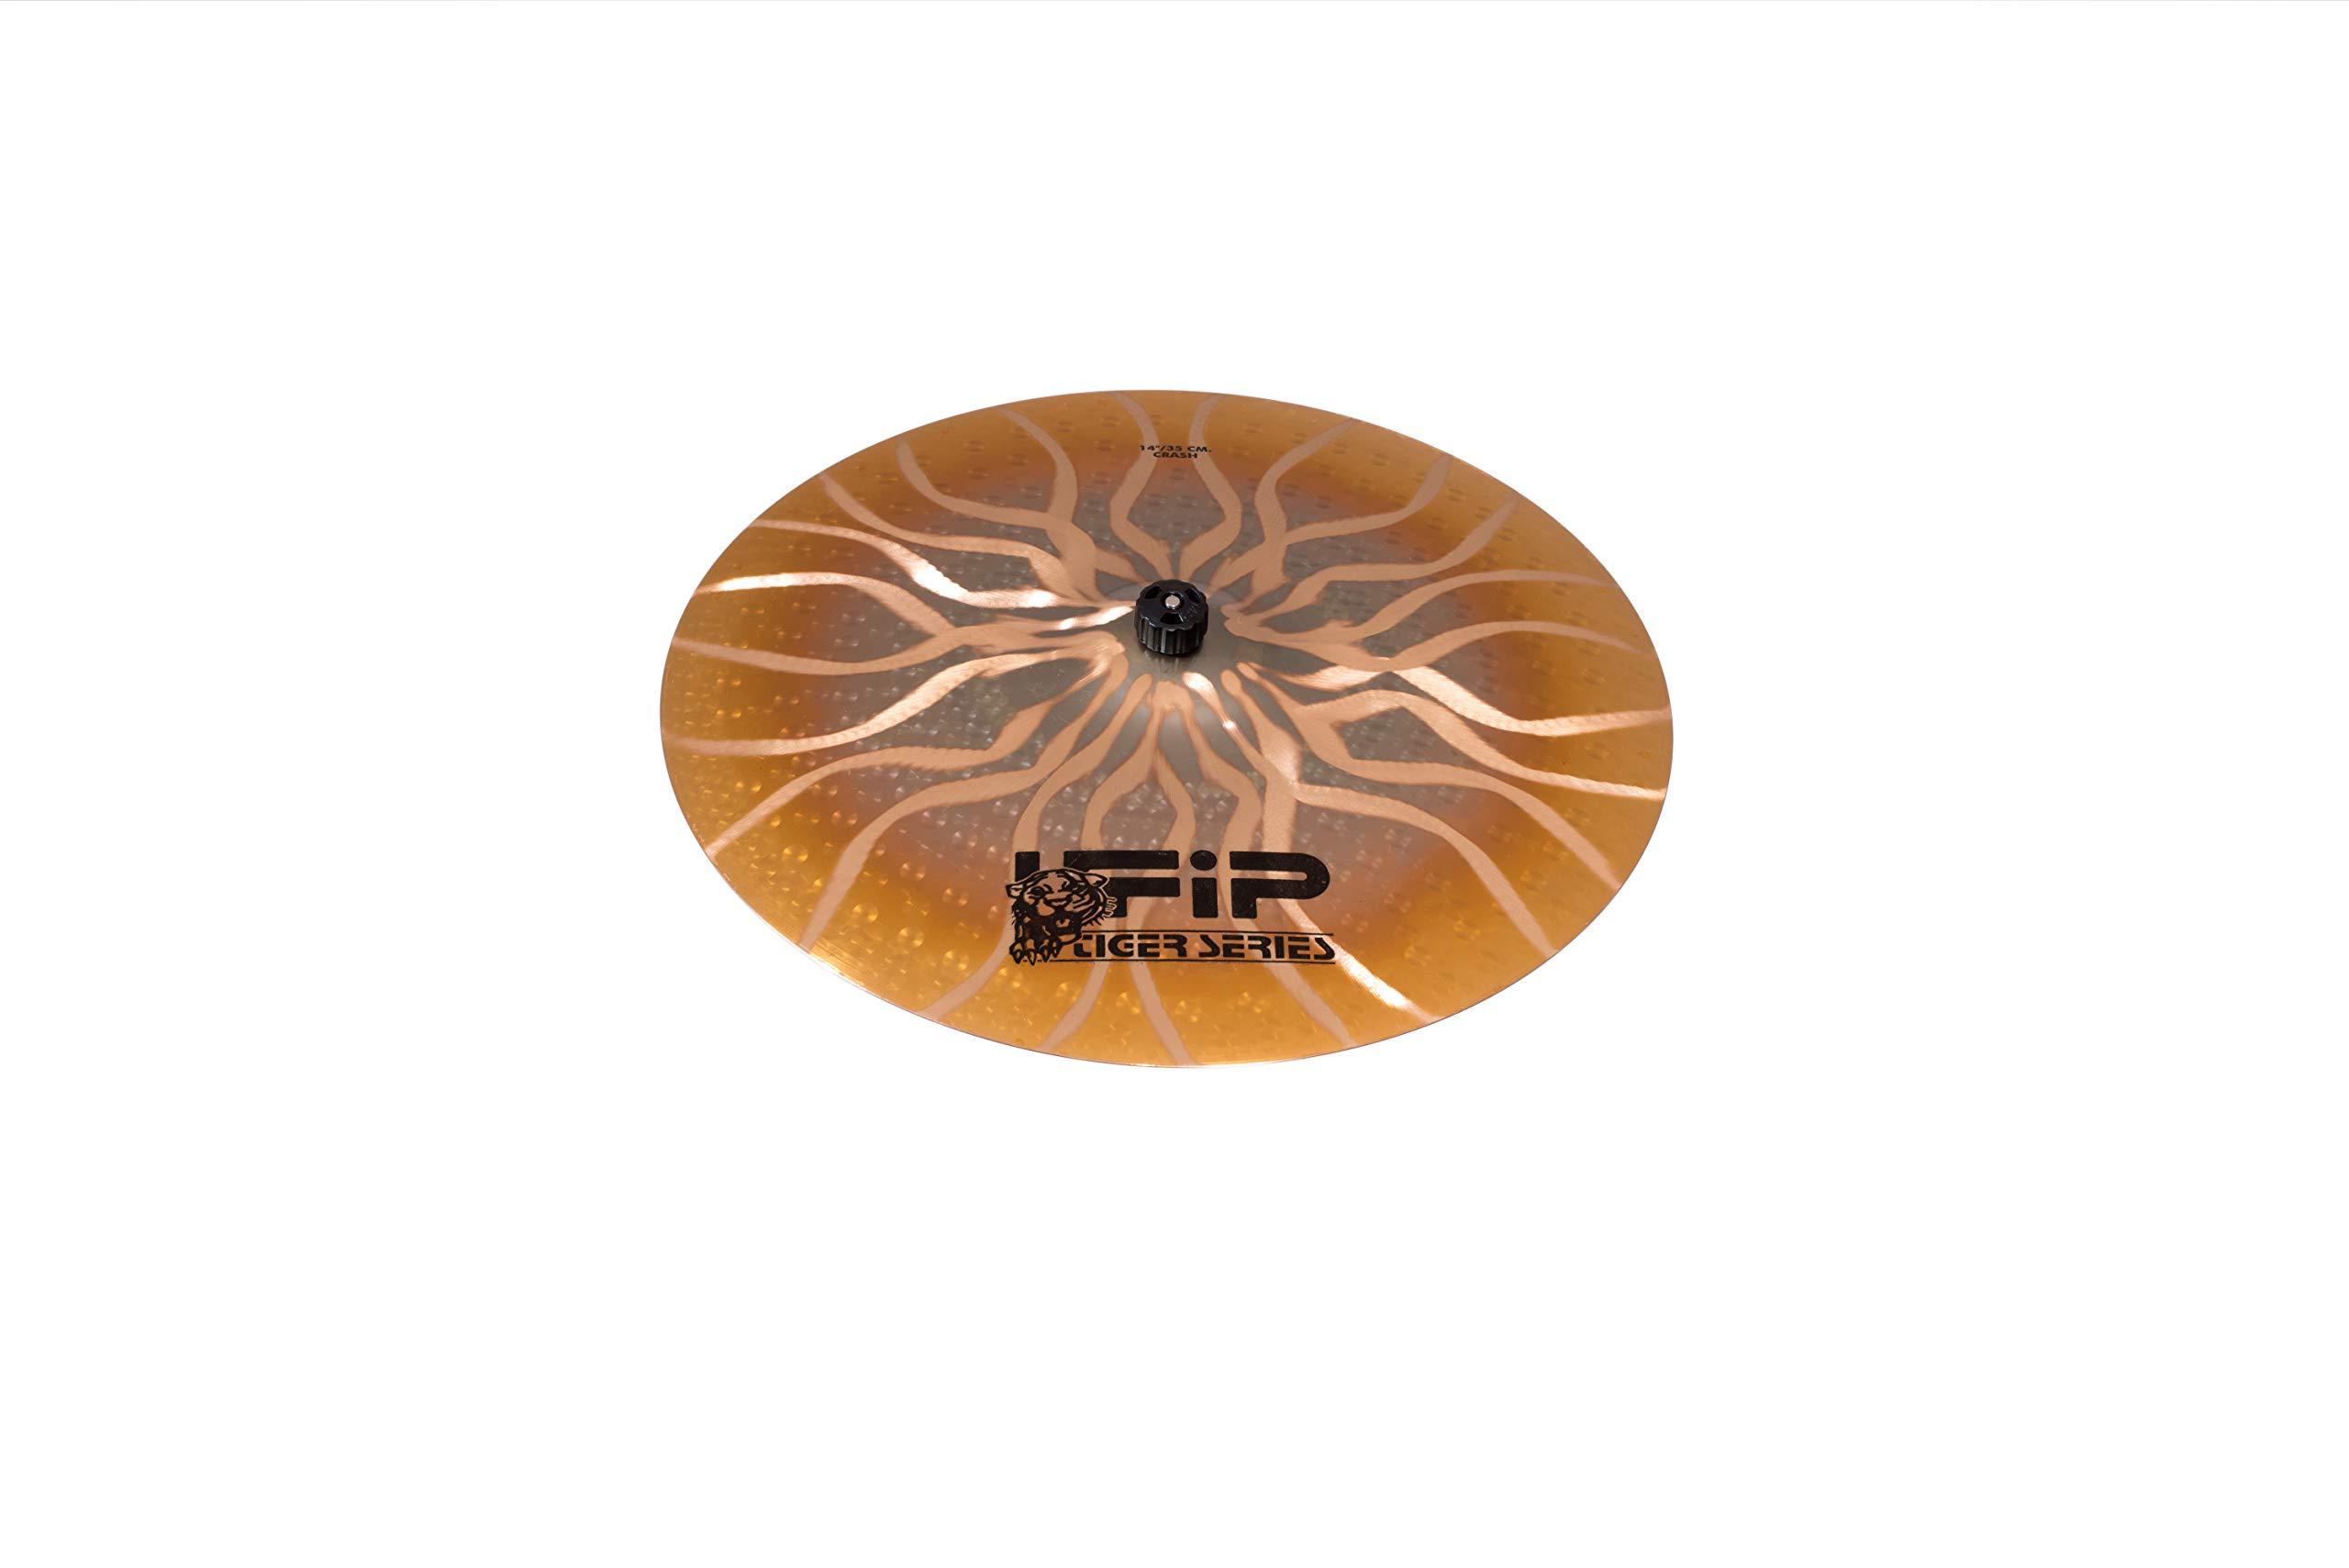 Ufip Tiger Series Crash Cymbal, 14 Inch (TS-14)